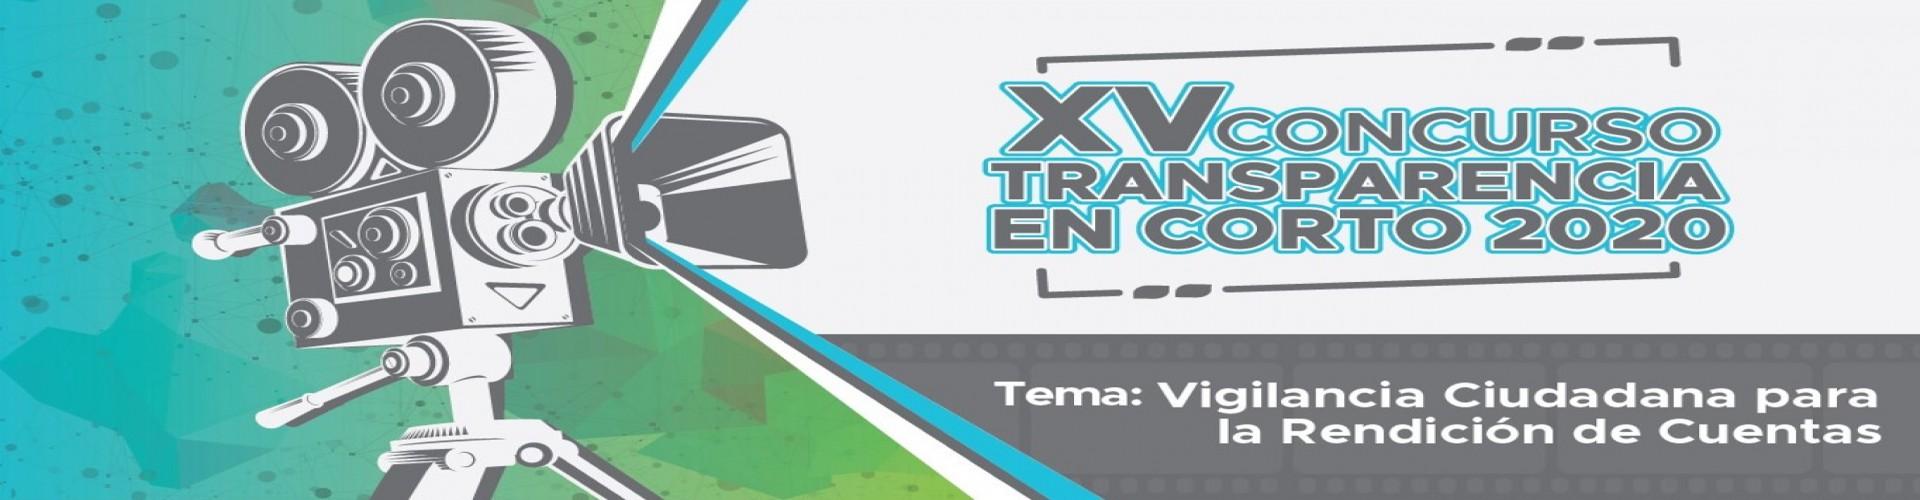 XV Concurso transparencia en corto 2020